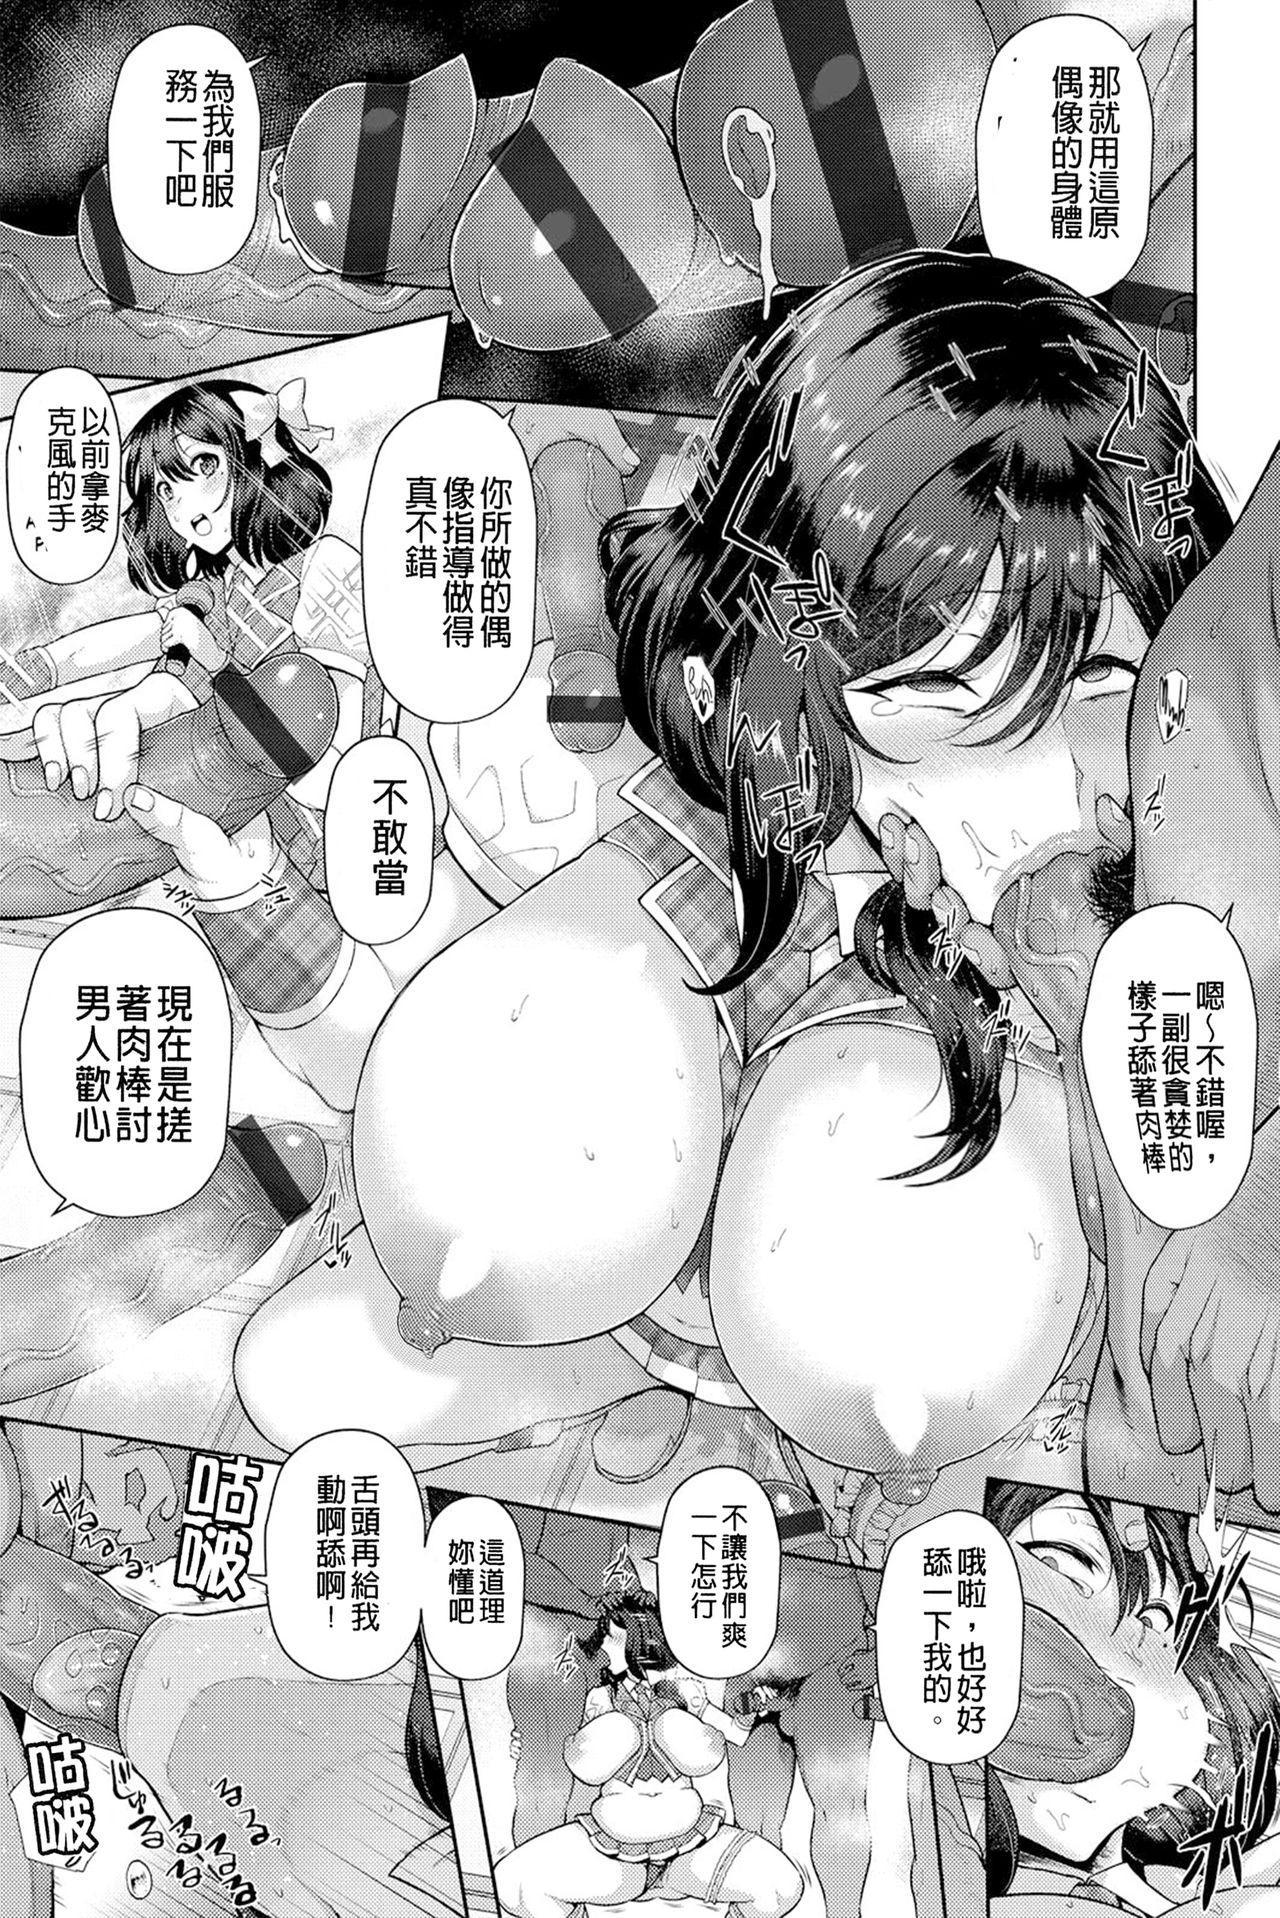 Juku Mesu - Erotic Mature Women 119